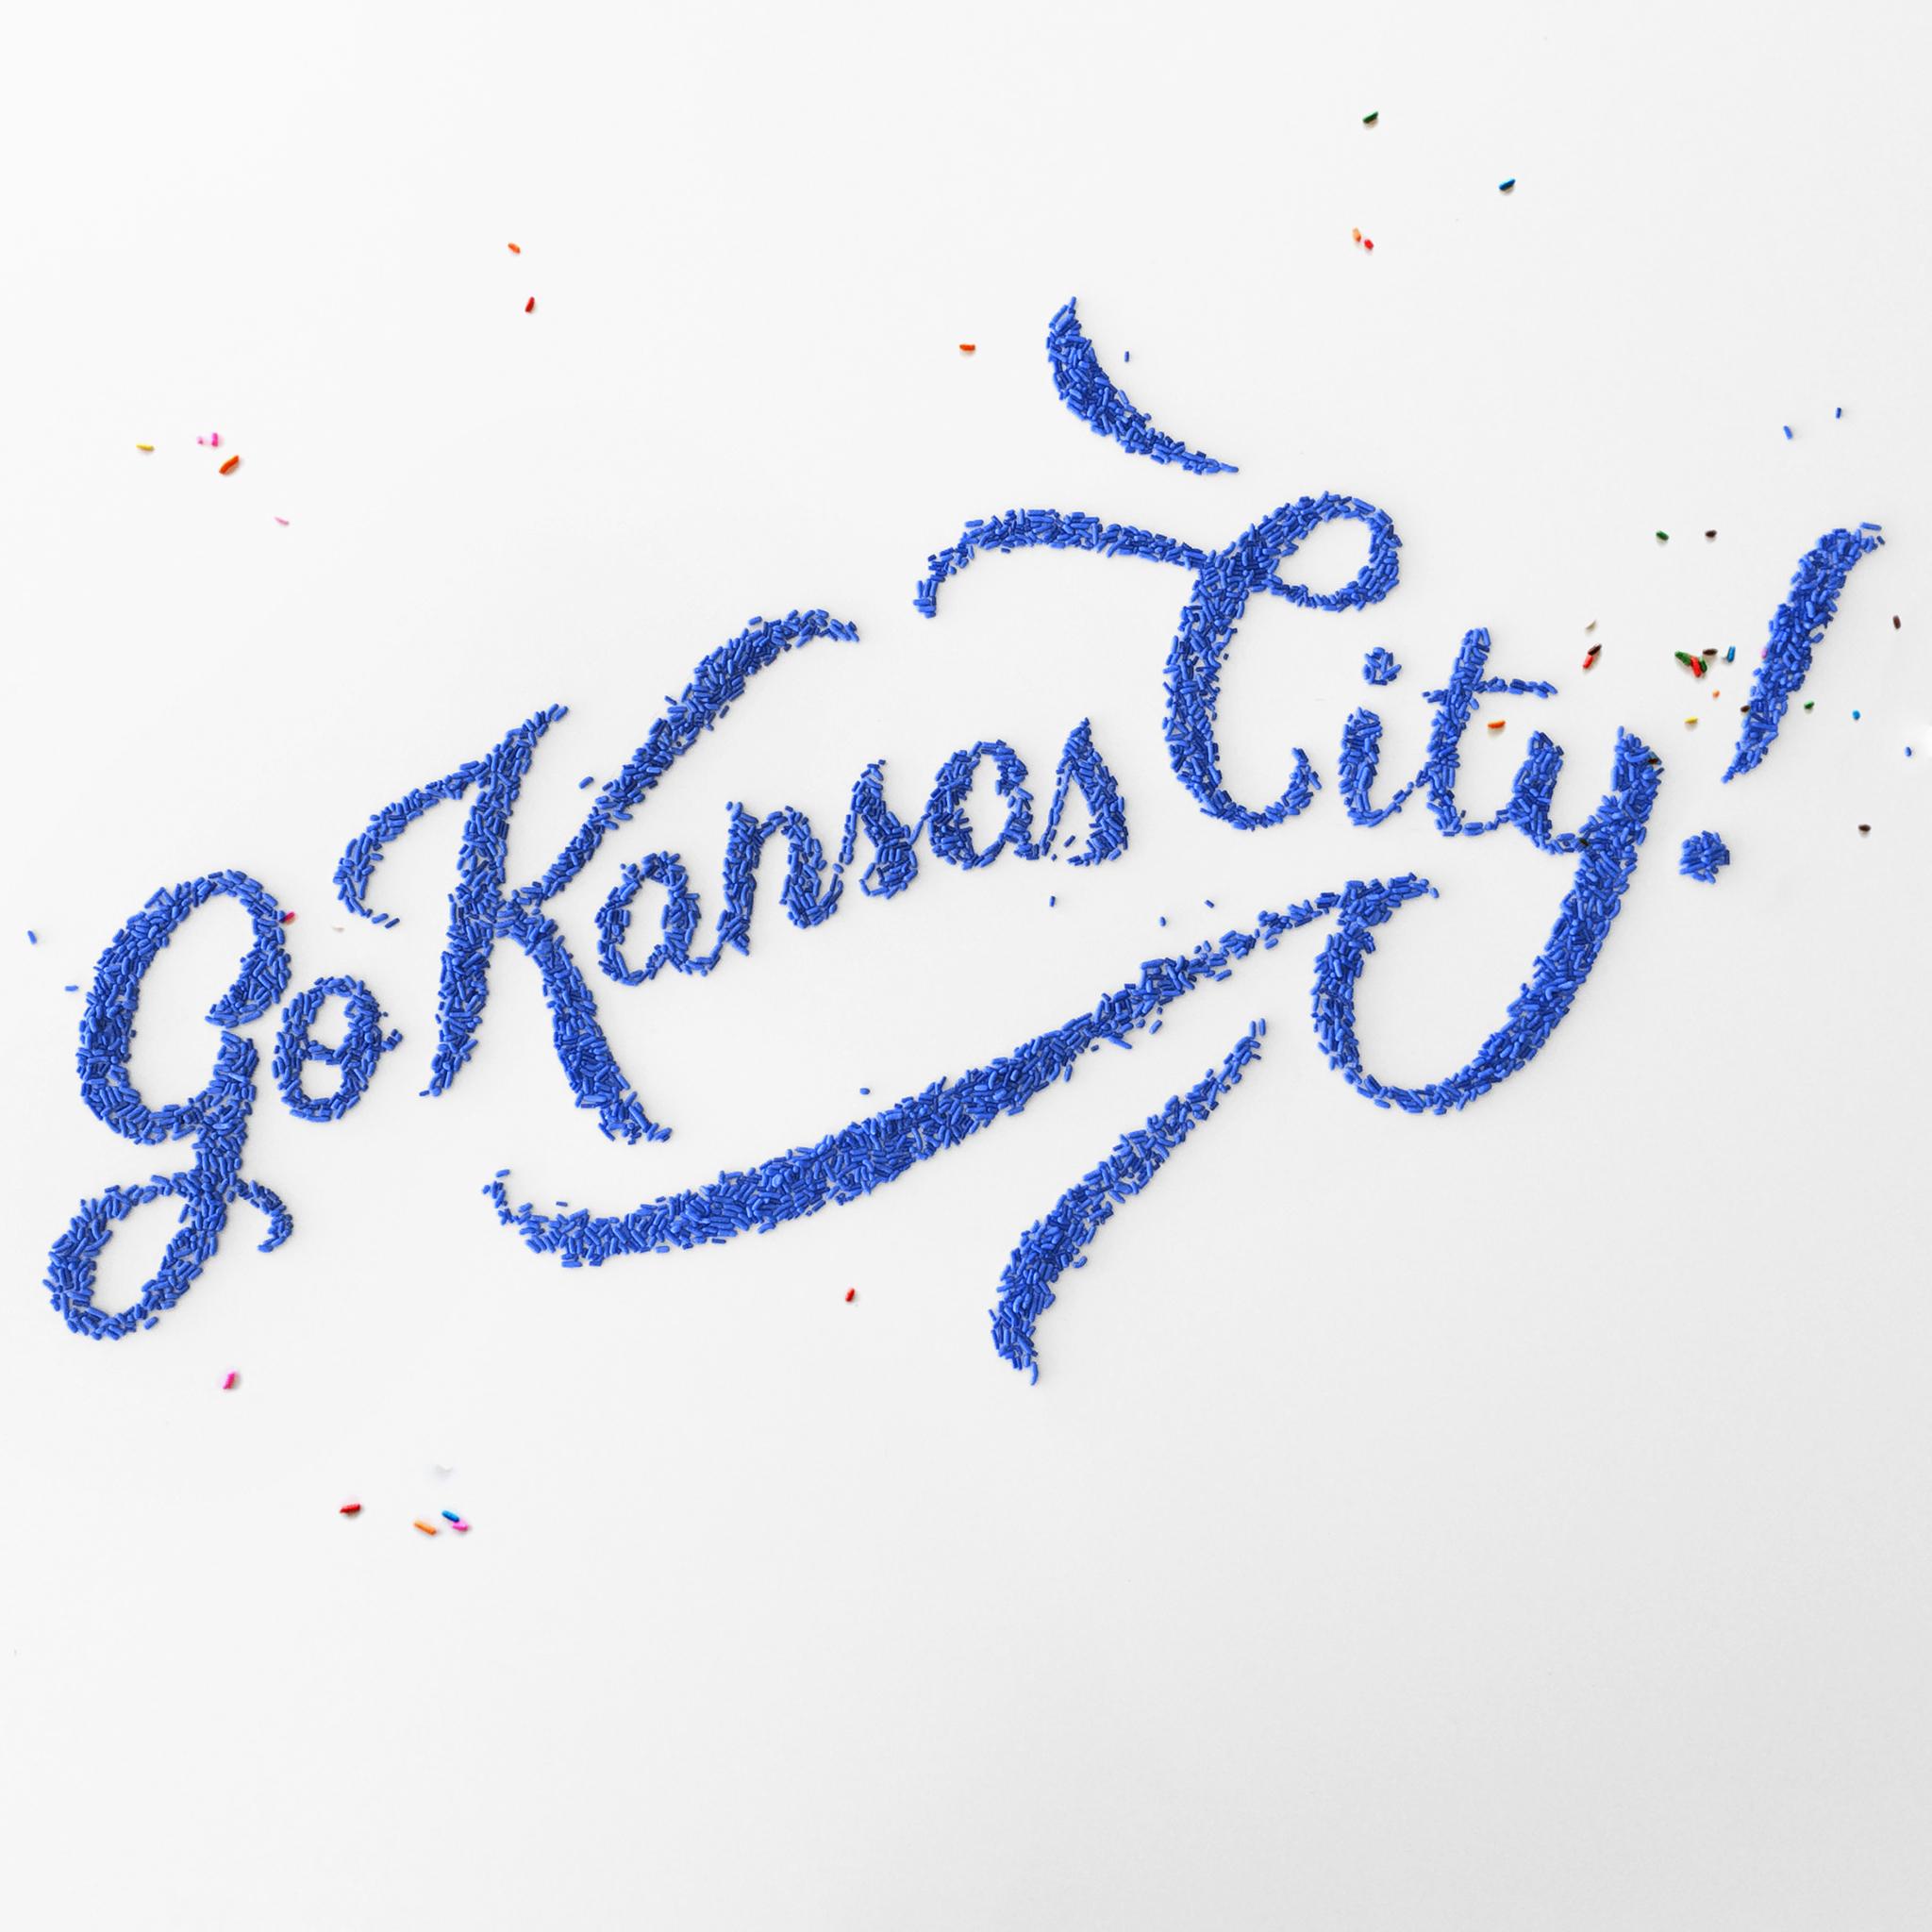 WS_BB_Sprinkles_KansasCity_nologo.jpg